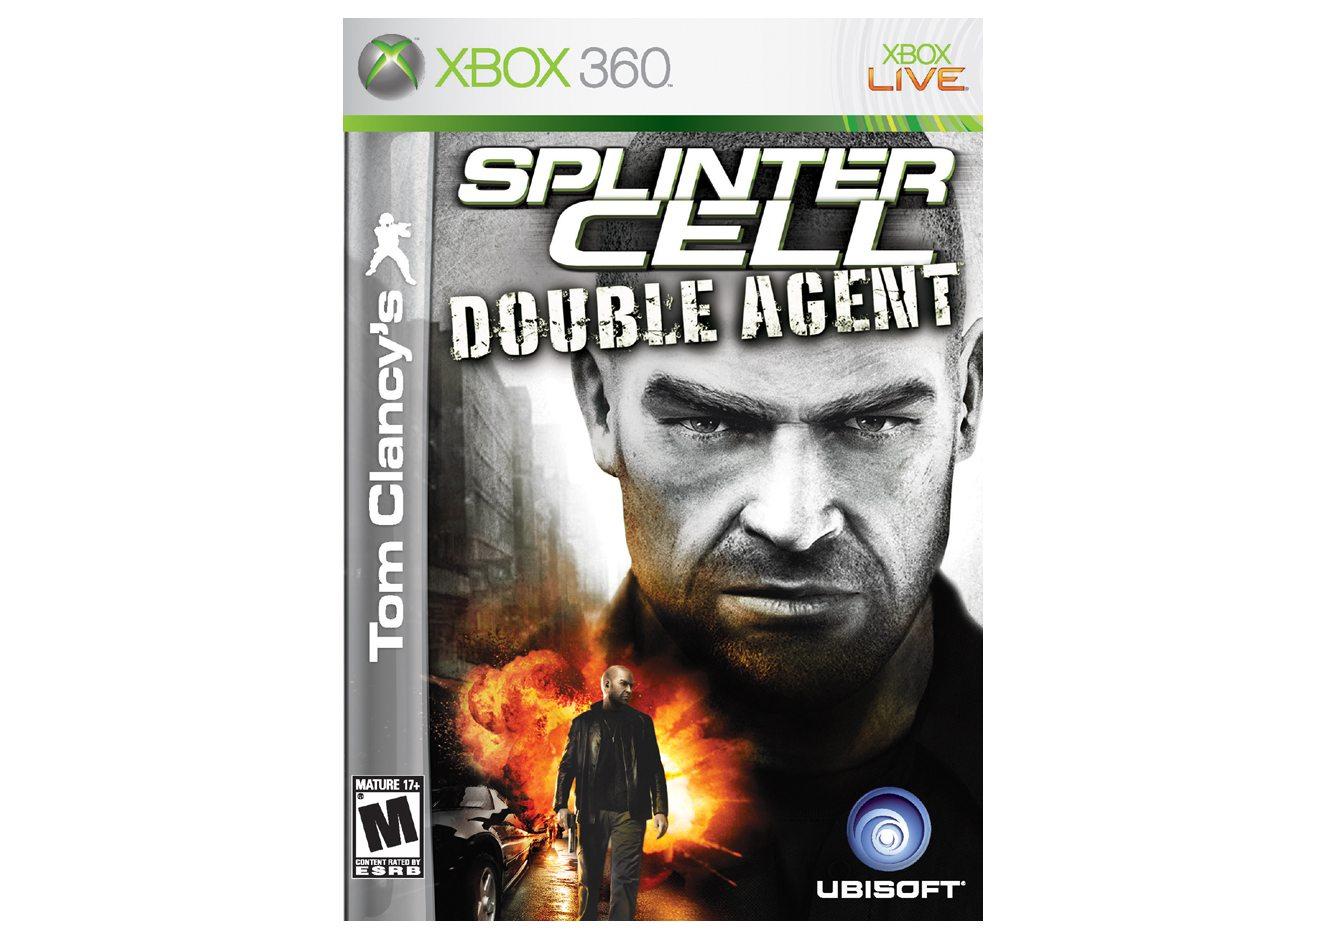 Xbox 360 Tom Clancy's Splinter Cell: Double Agent Xbox 360